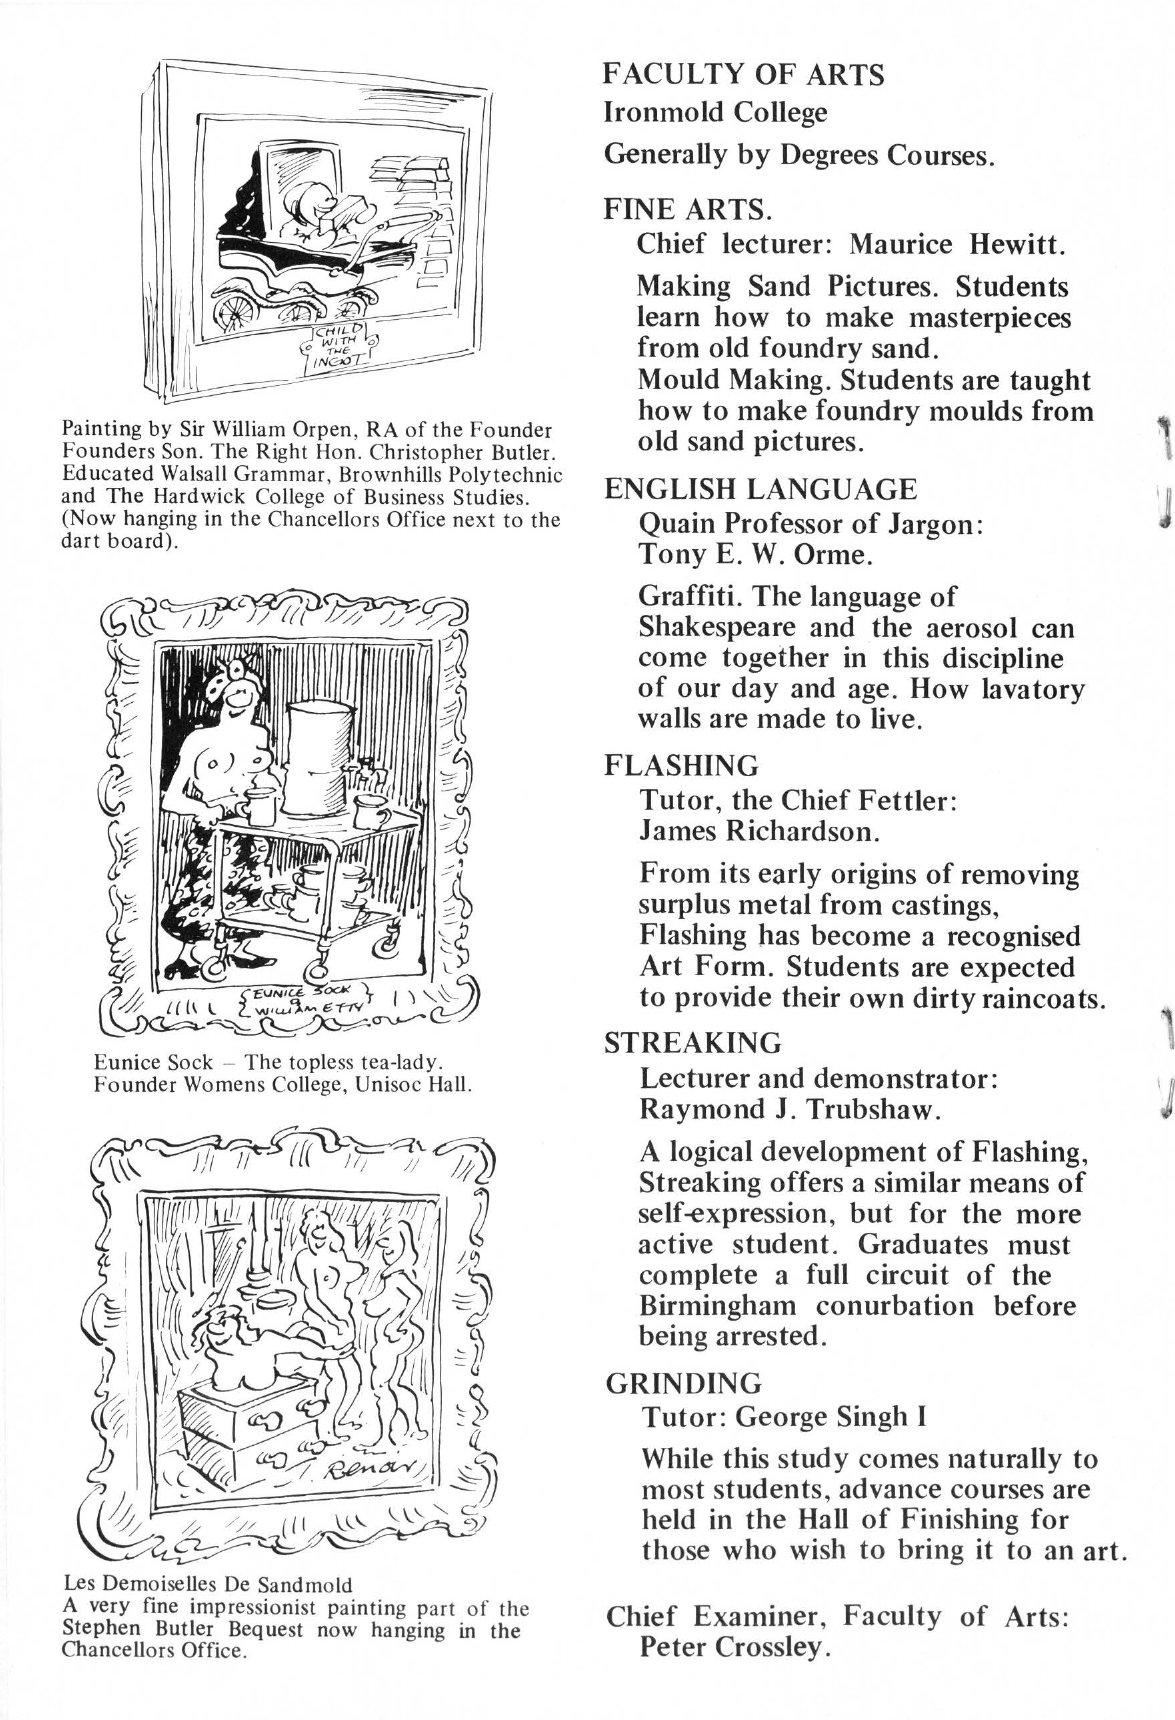 Casting aspersions – the University of Brownhills Prospectus 1979-80